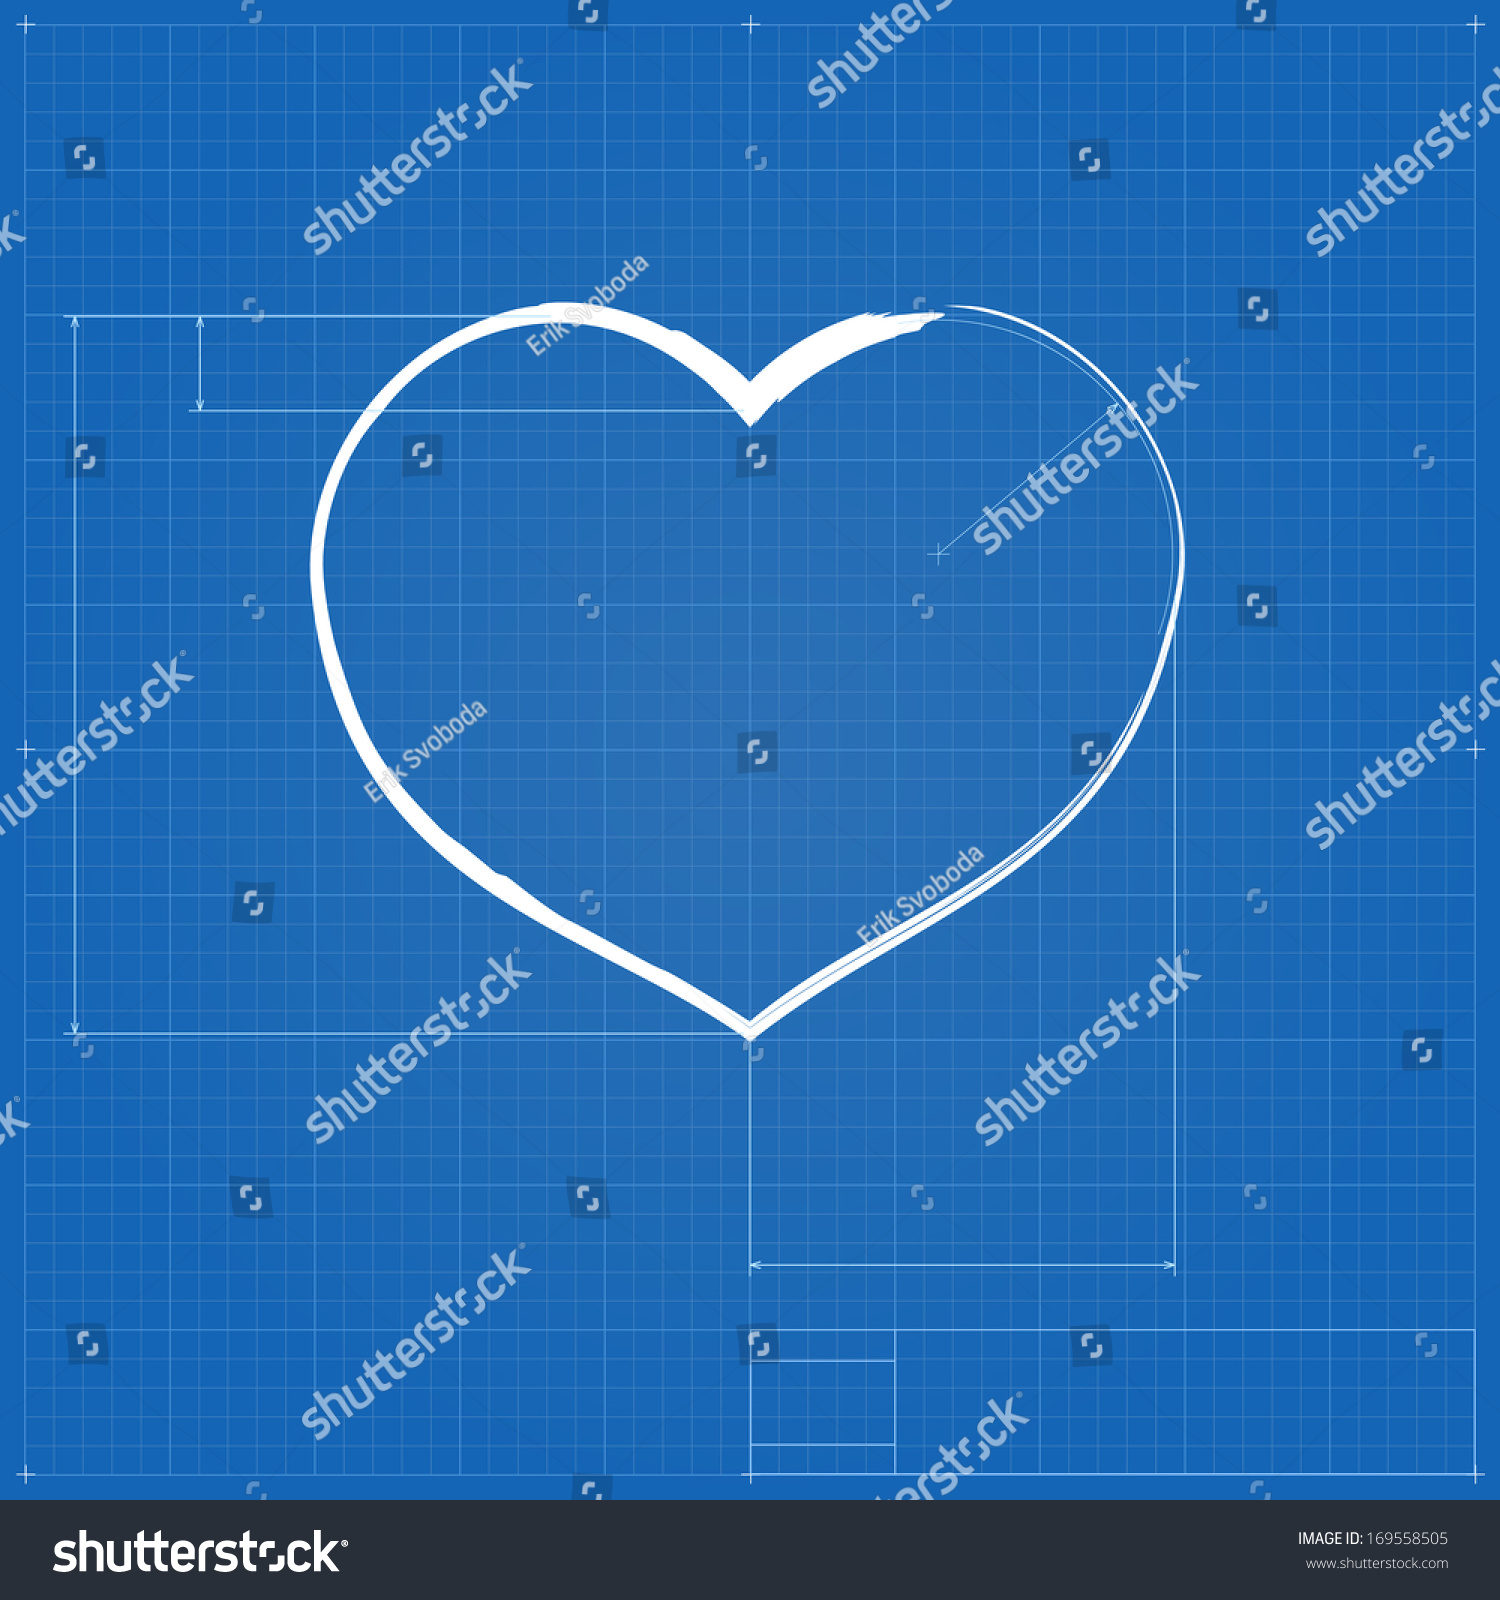 Heart symbol like blueprint drawing stylized stock illustration heart symbol like blueprint drawing stylized drafting of gift sign on blueprint paper illustration malvernweather Image collections